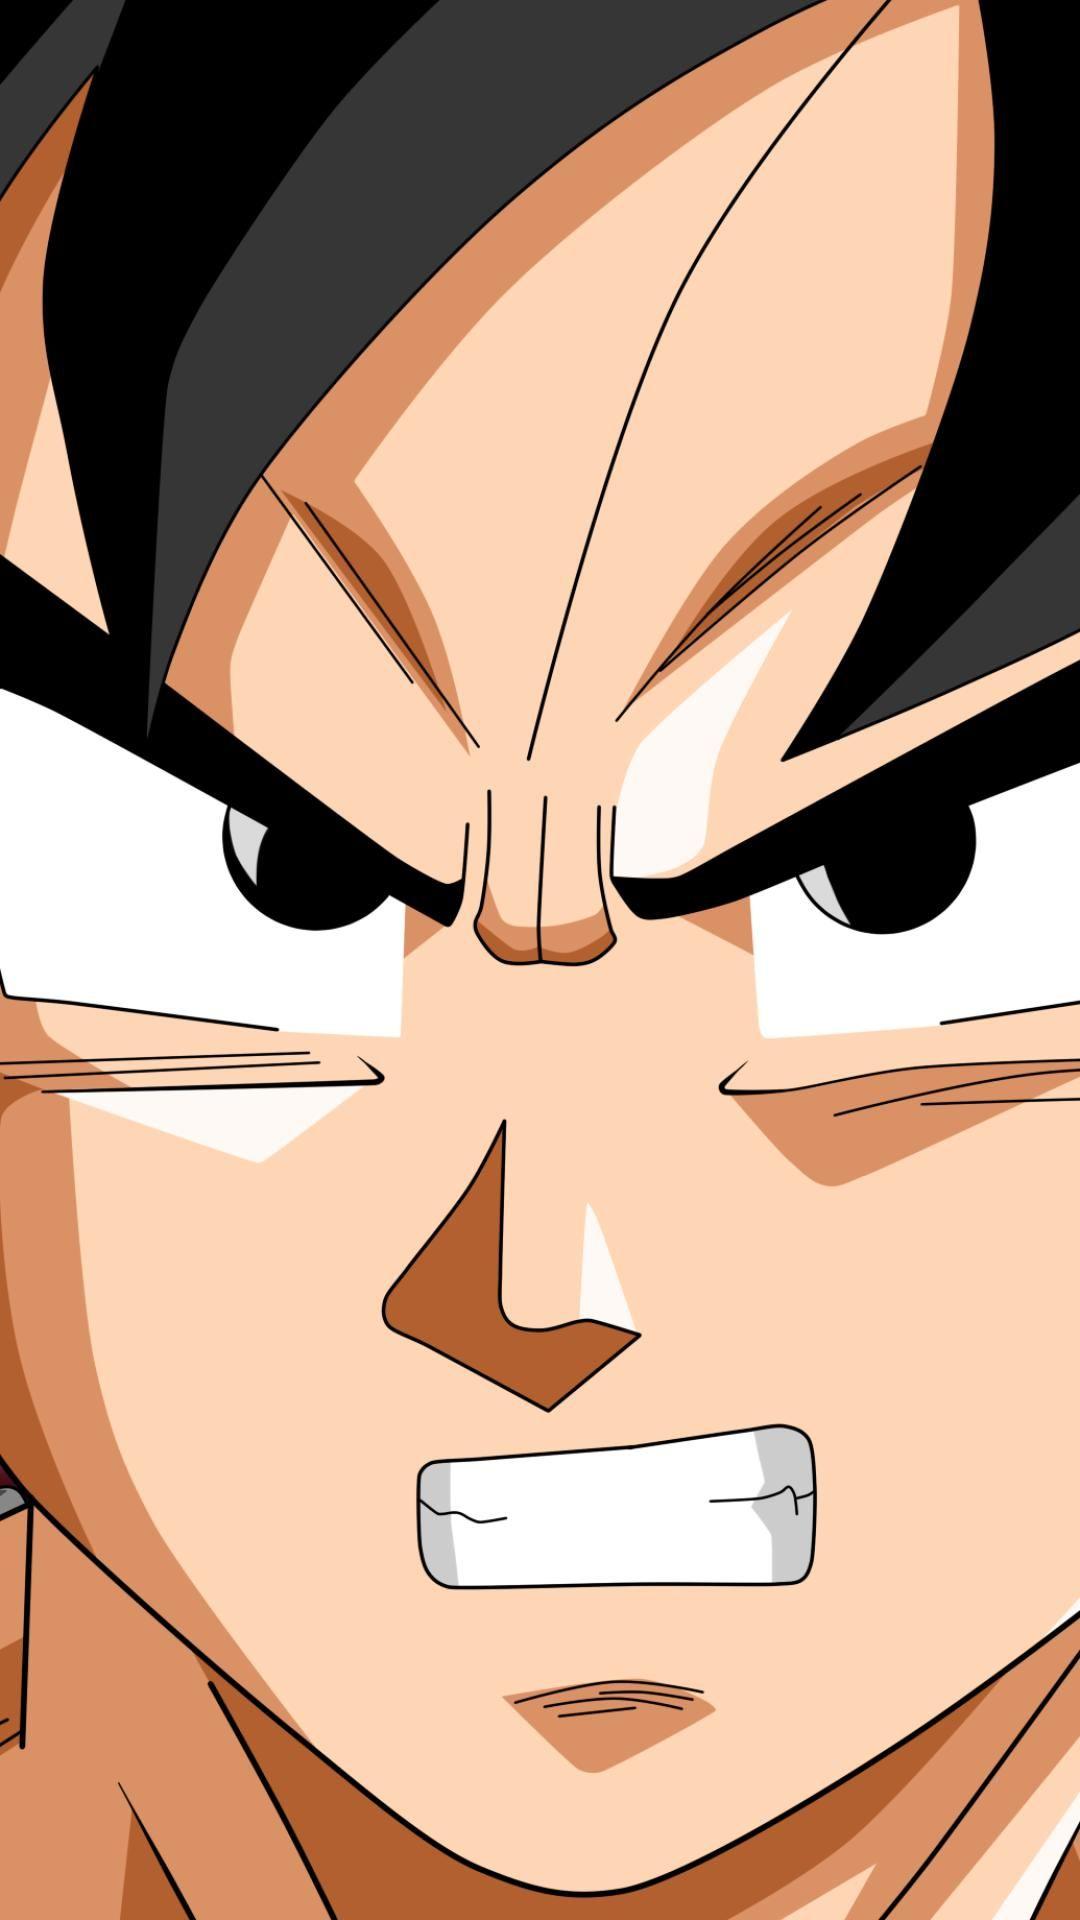 Hd Wallpaper 182 Personajes De Dragon Ball Dragones Dibujo De Goku